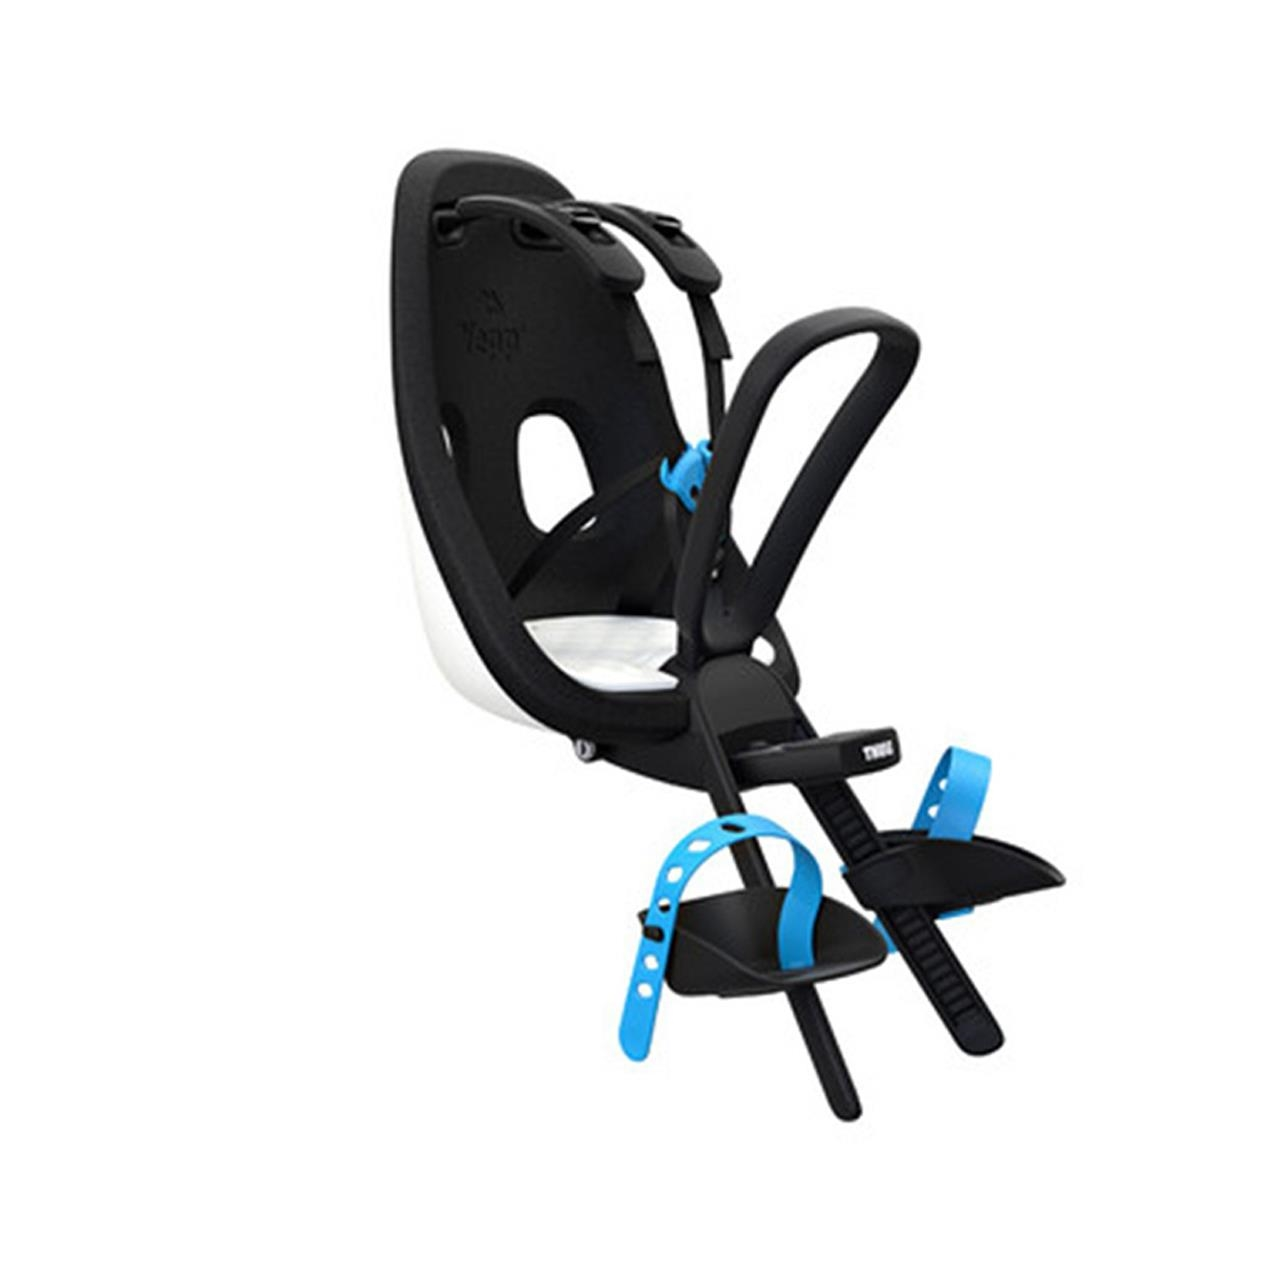 Scaun pentru copii, cu montare pe bicicleta in fata - Thule Yepp Nexxt Mini WHITE imagine